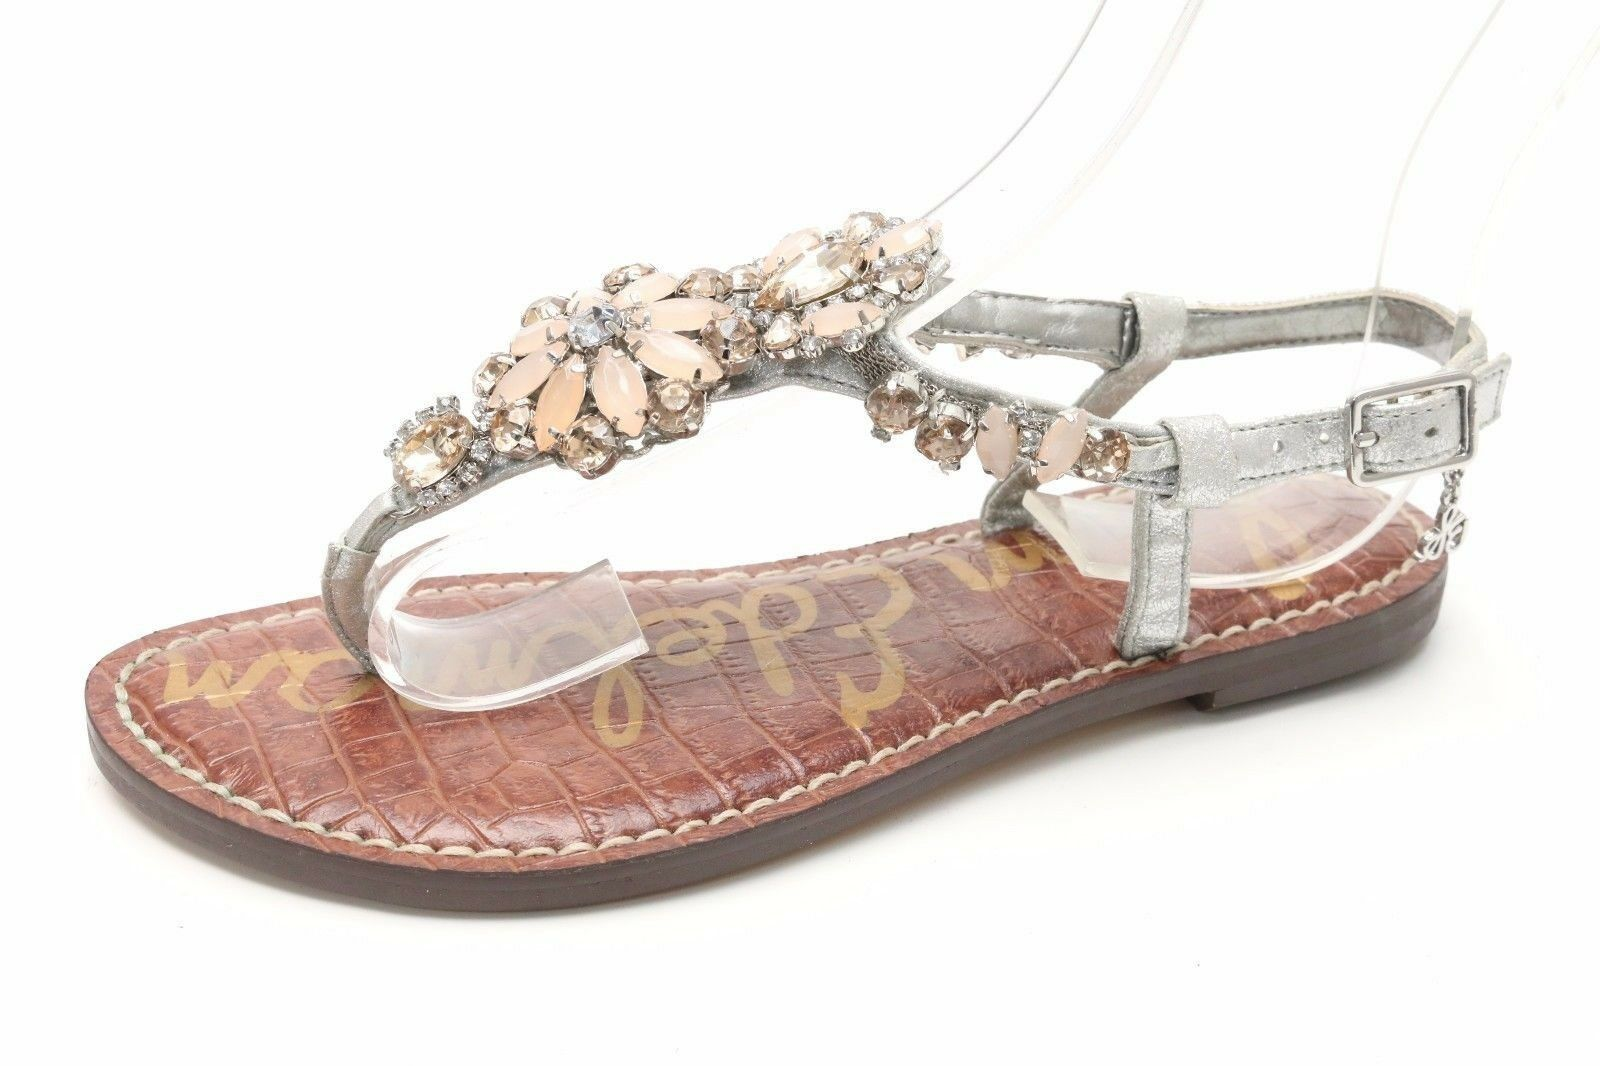 Sam Edelman GAREN gris   Jeweled Leather T-Bar Sandals Sz. 4 US 38.5 EU  129.95